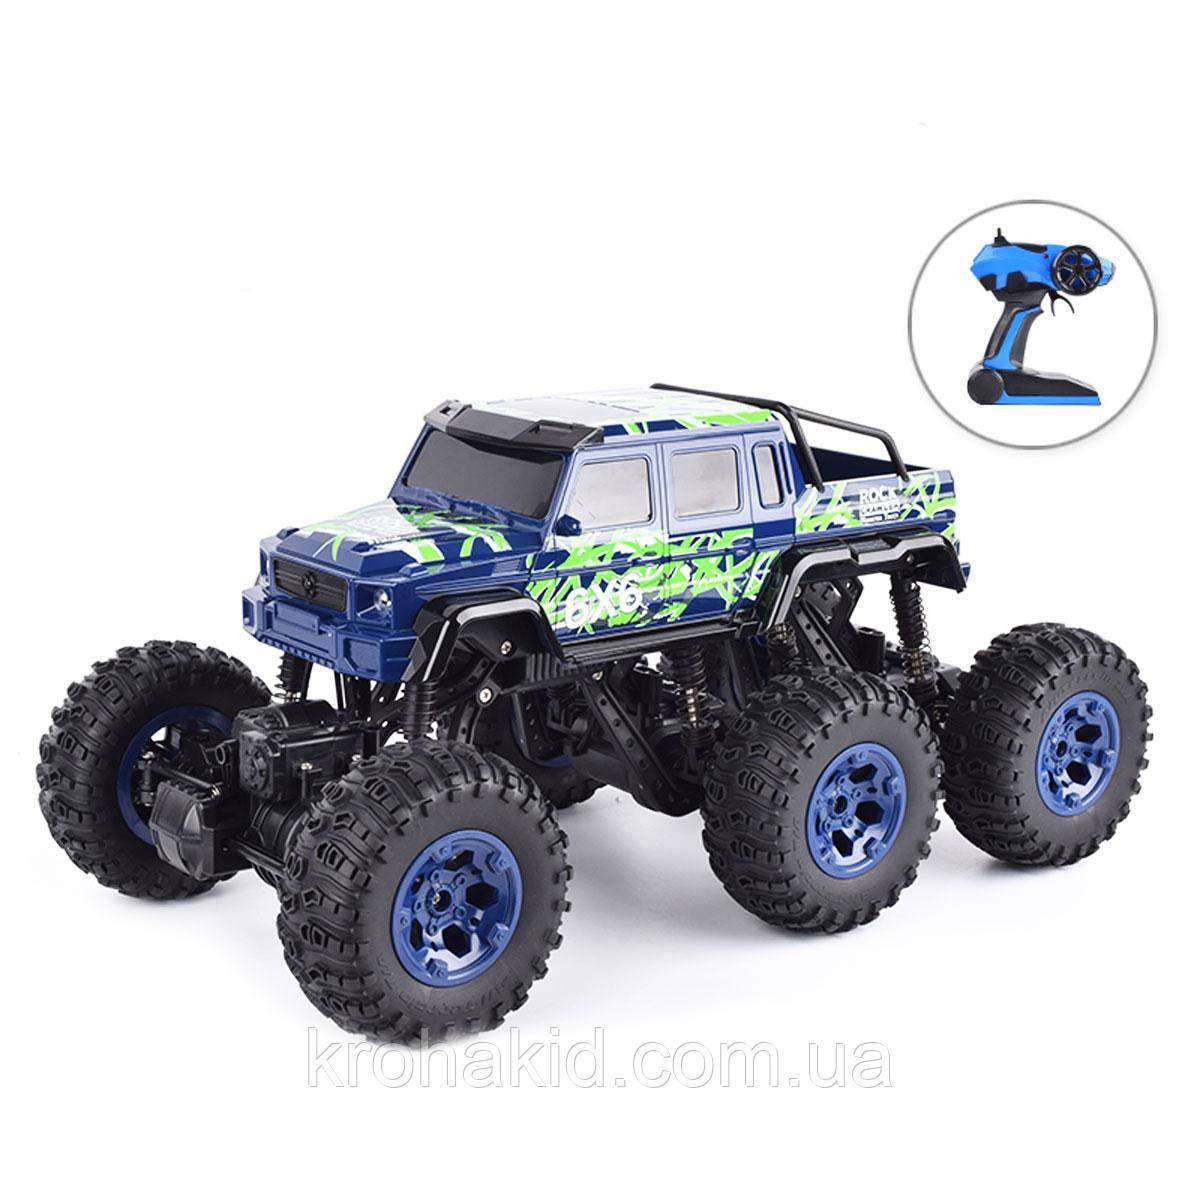 Машина на радіокеруванні Rock Crawler - 26612B ( Blue )